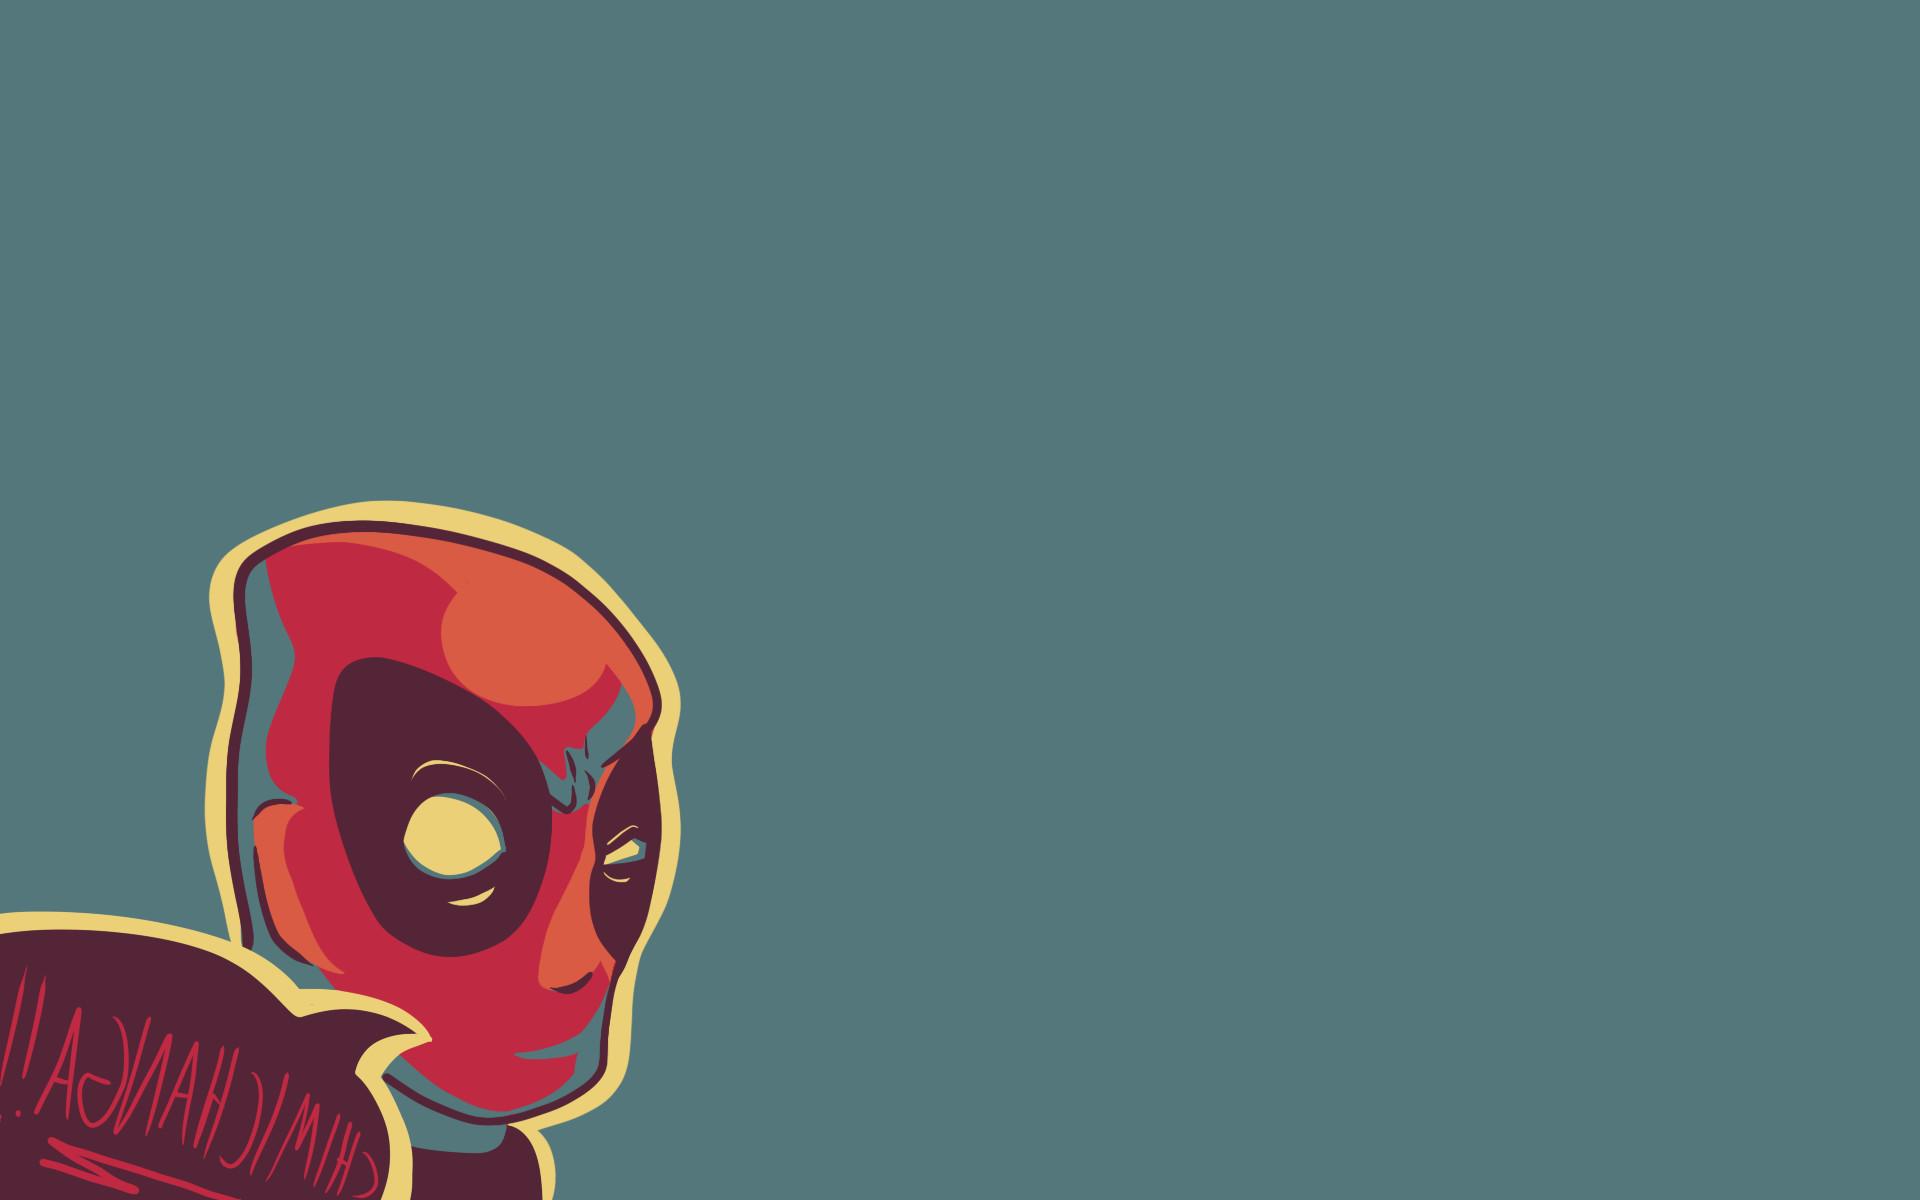 deadpool hd desktop wallpaper (75+ images)